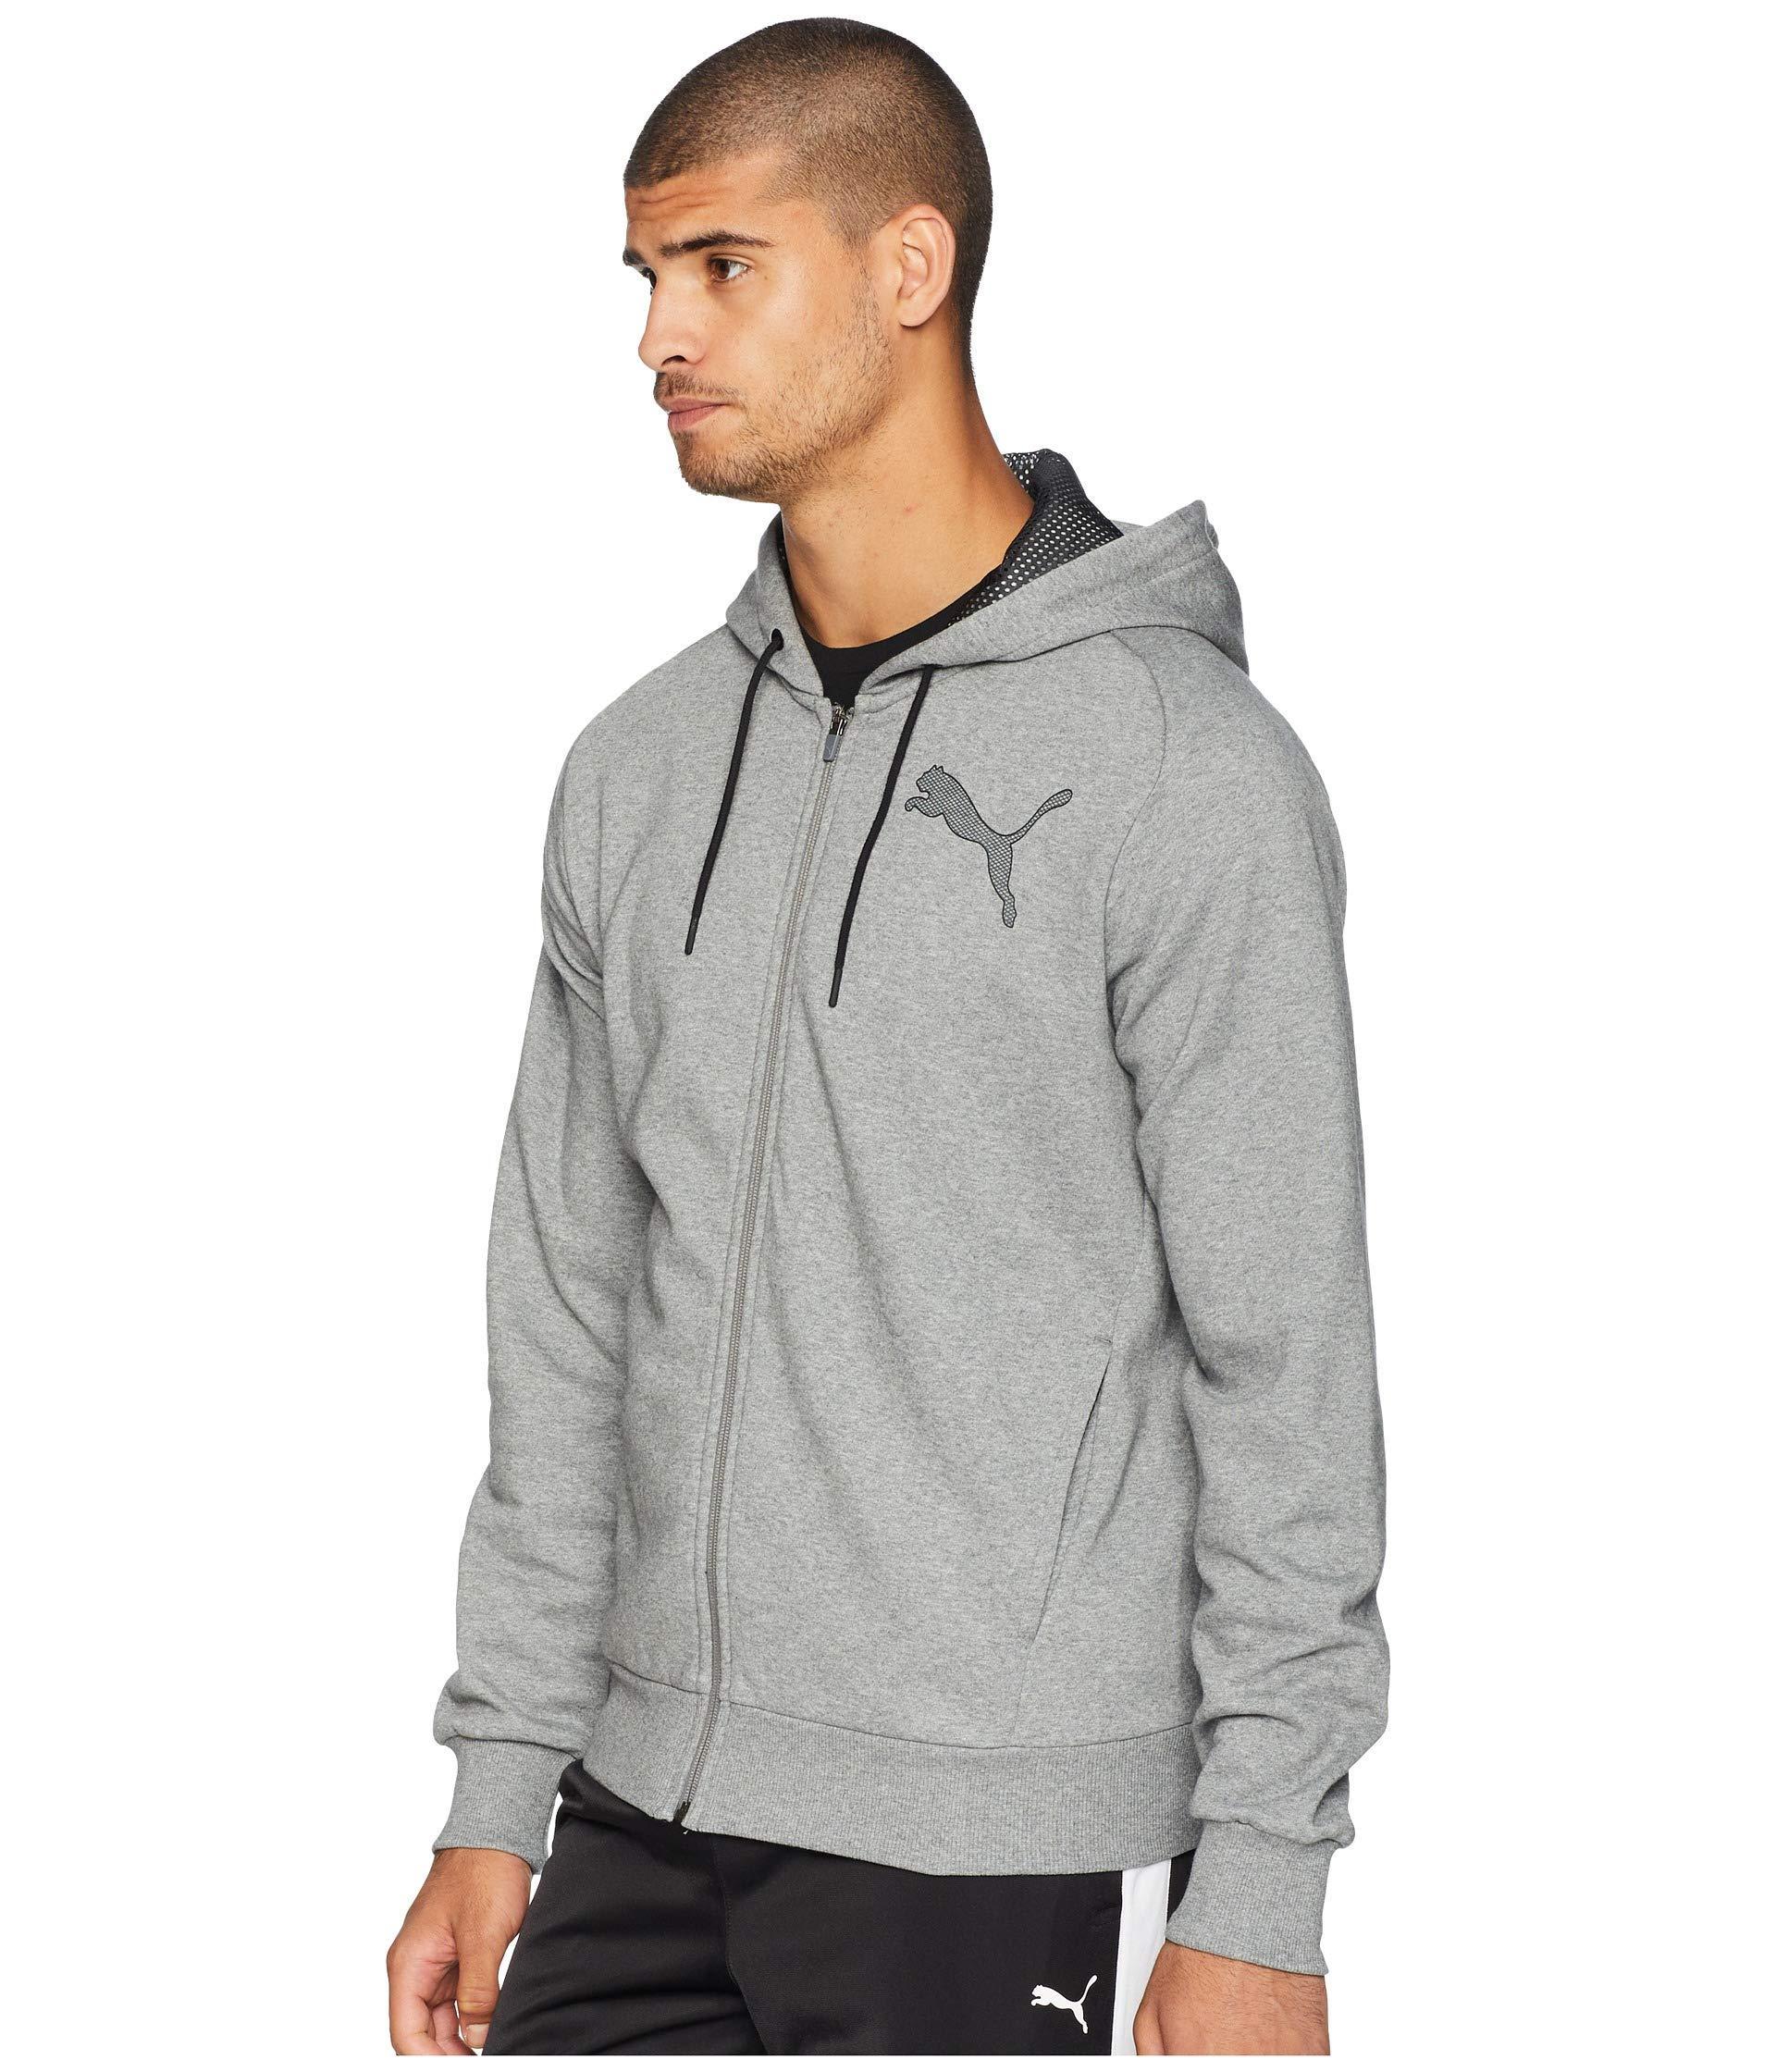 419353b698c0 Lyst - PUMA P48 Modern Sport Full Zip Fleece Hoodie in Gray for Men - Save  11%